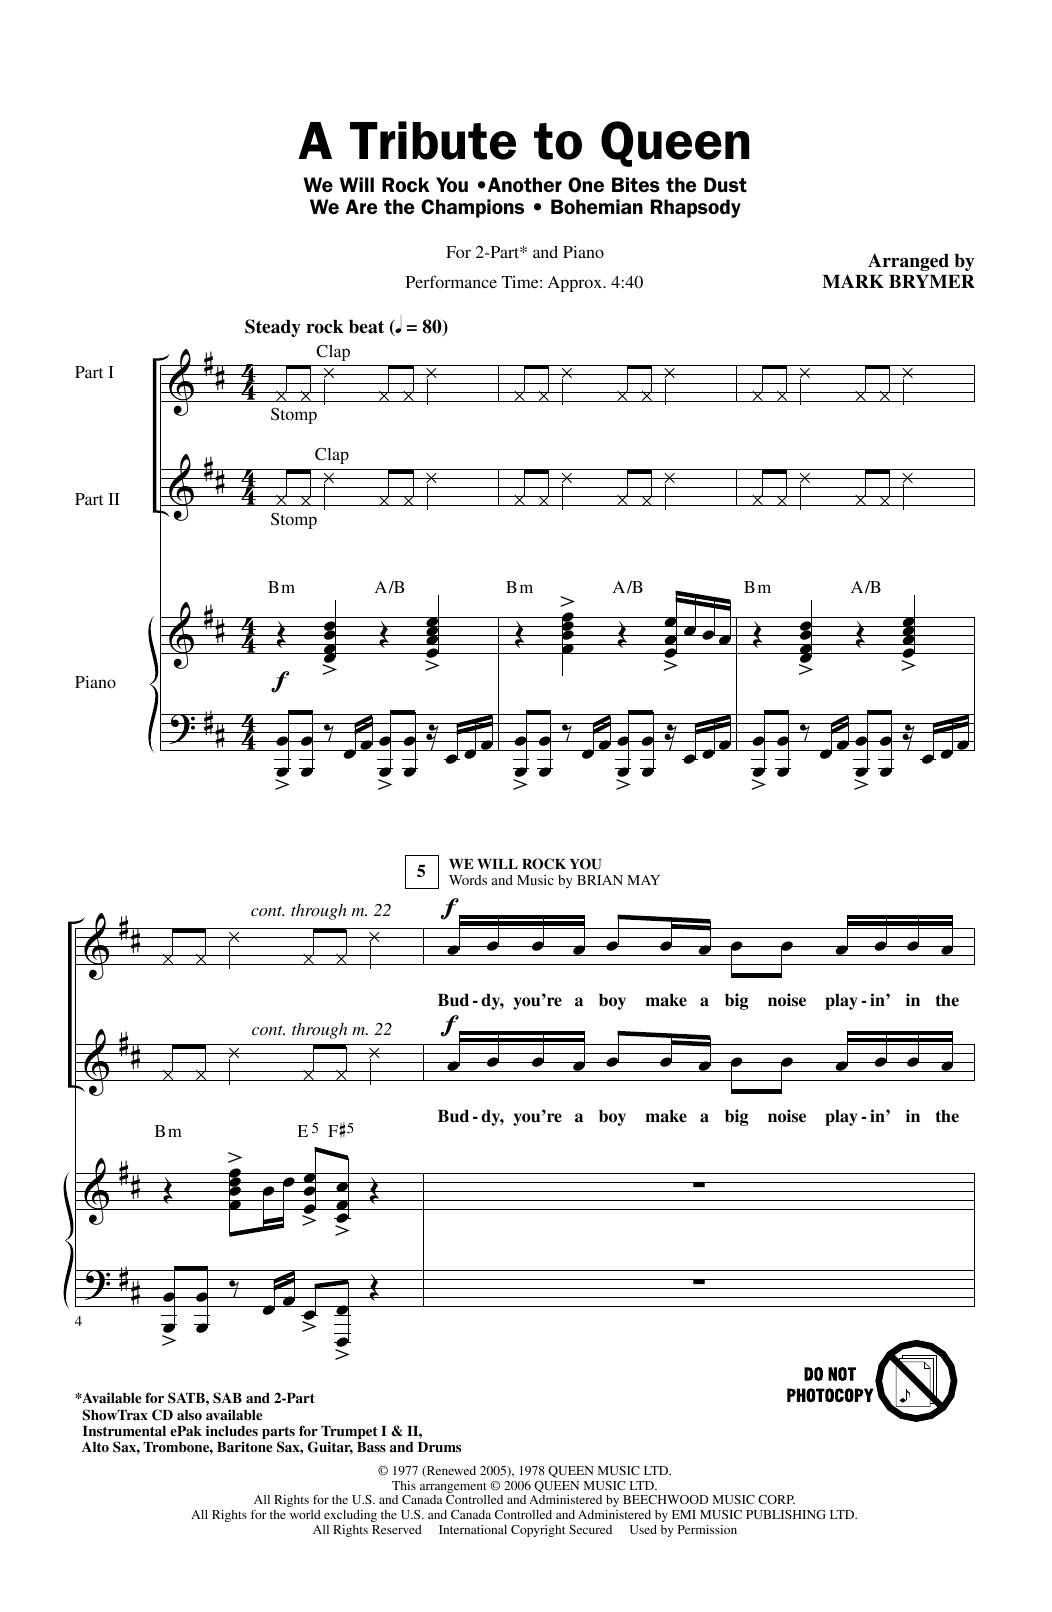 A Tribute To Queen (Medley) (arr. Mark Brymer) (2-Part Choir)